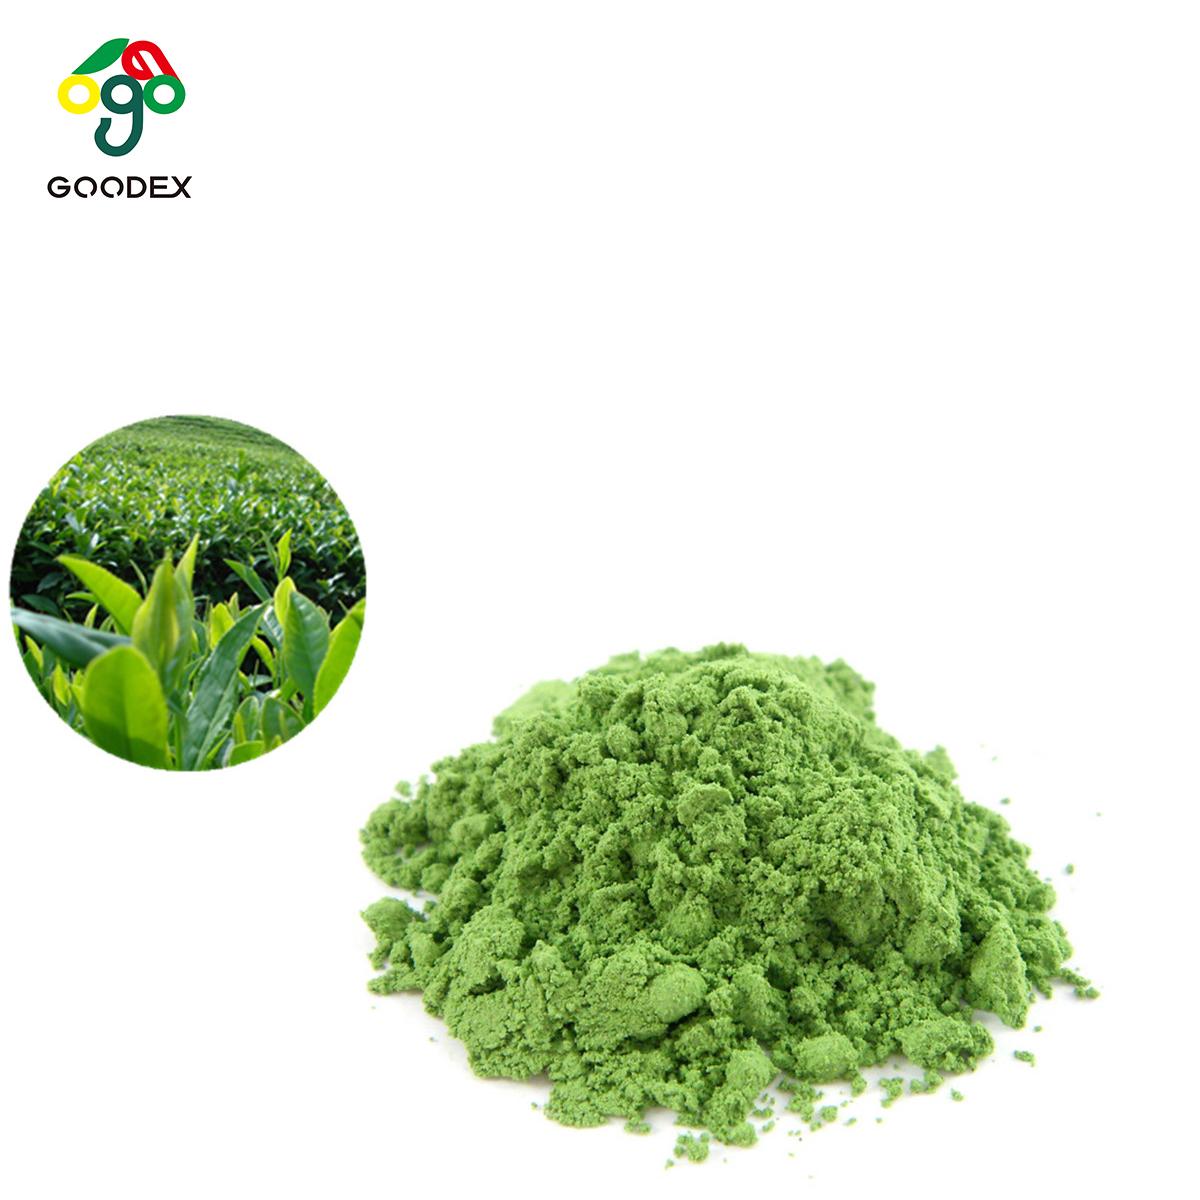 100% Pure Organic Best Green Tea Matcha - 4uTea   4uTea.com